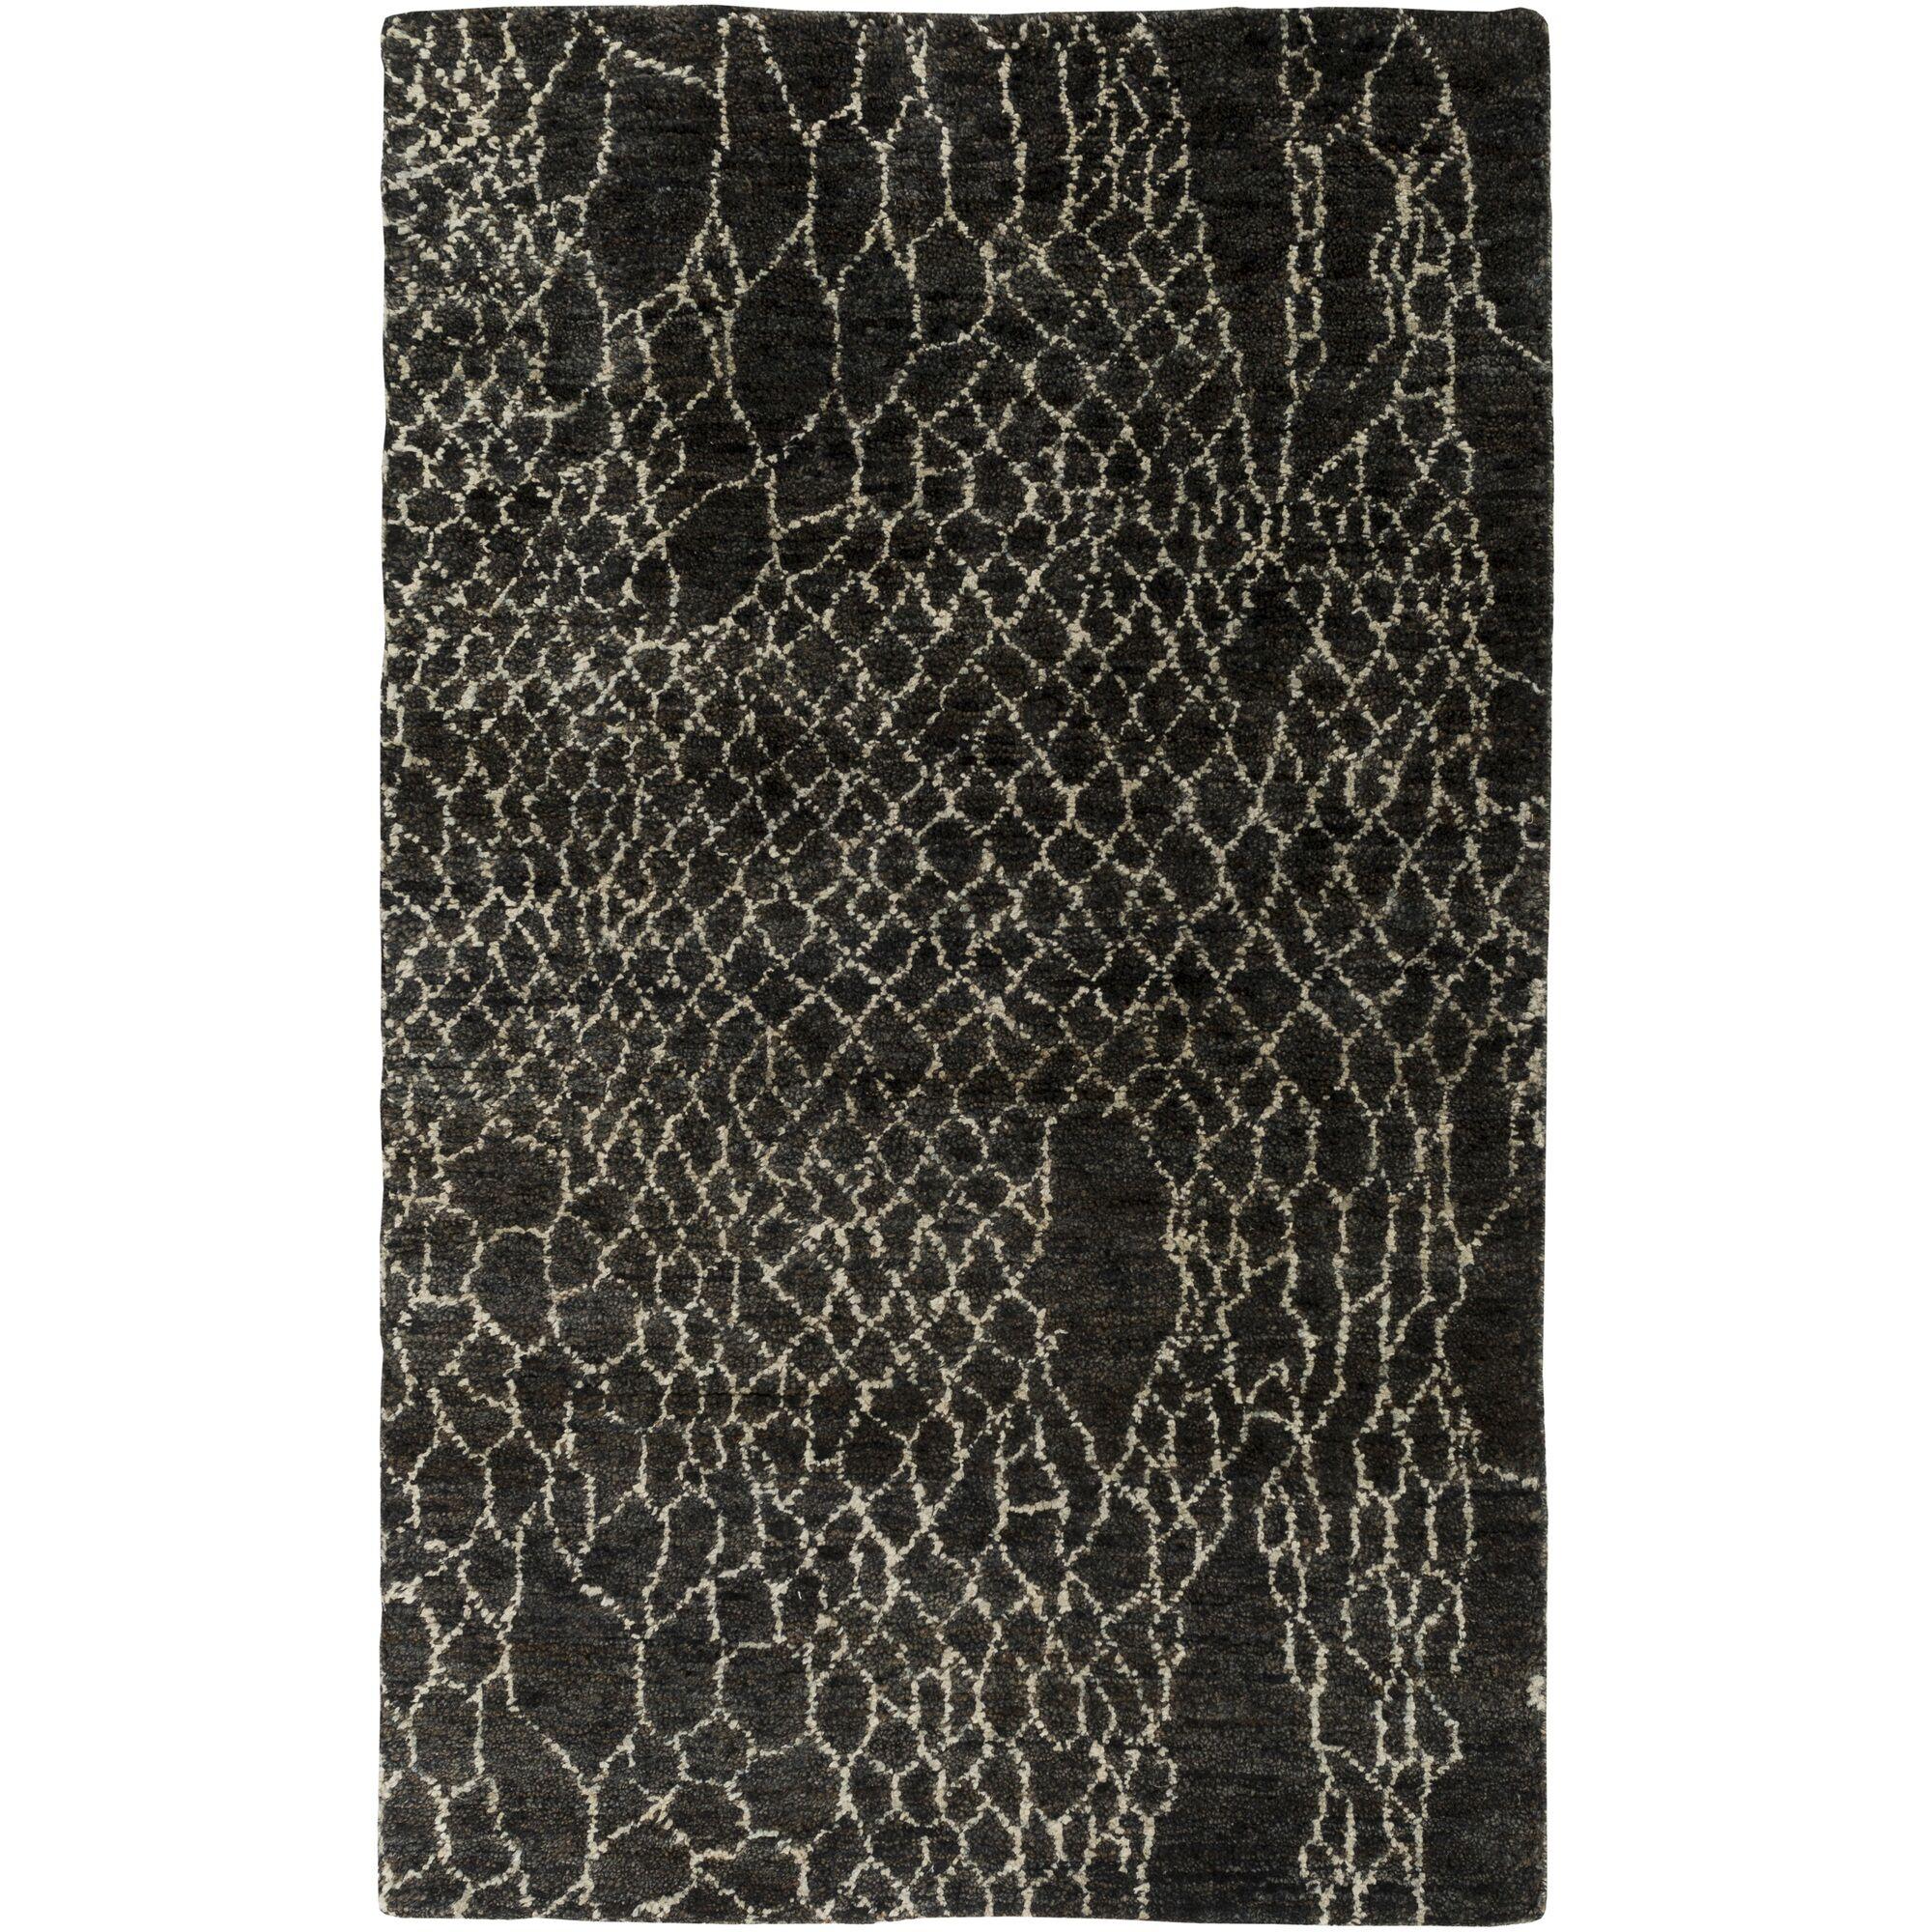 Bjorn Black Area Rug Rug Size: Rectangle 2' x 3'